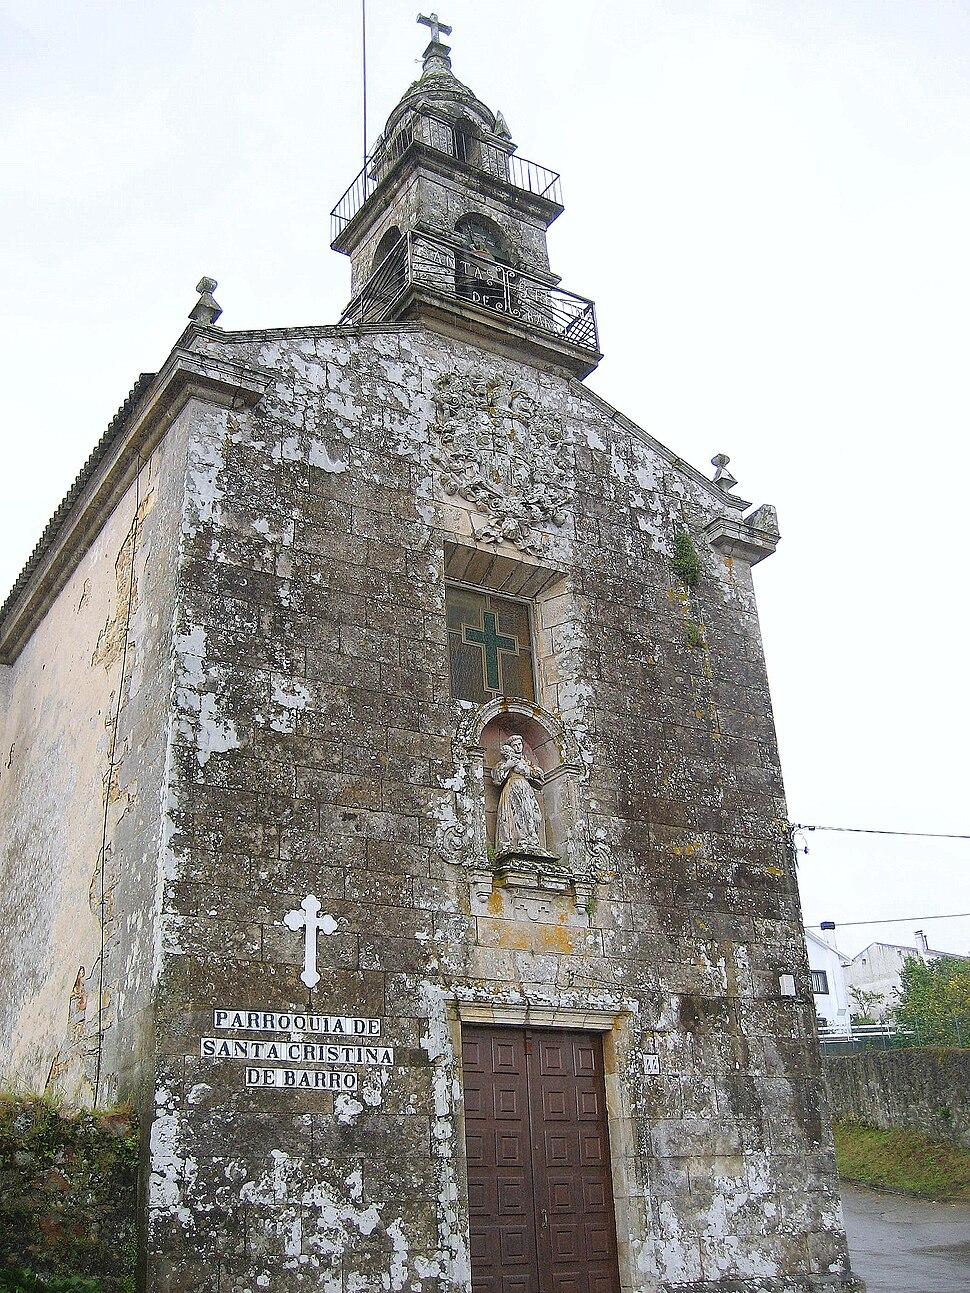 Santa Cristina de Barro, Noia